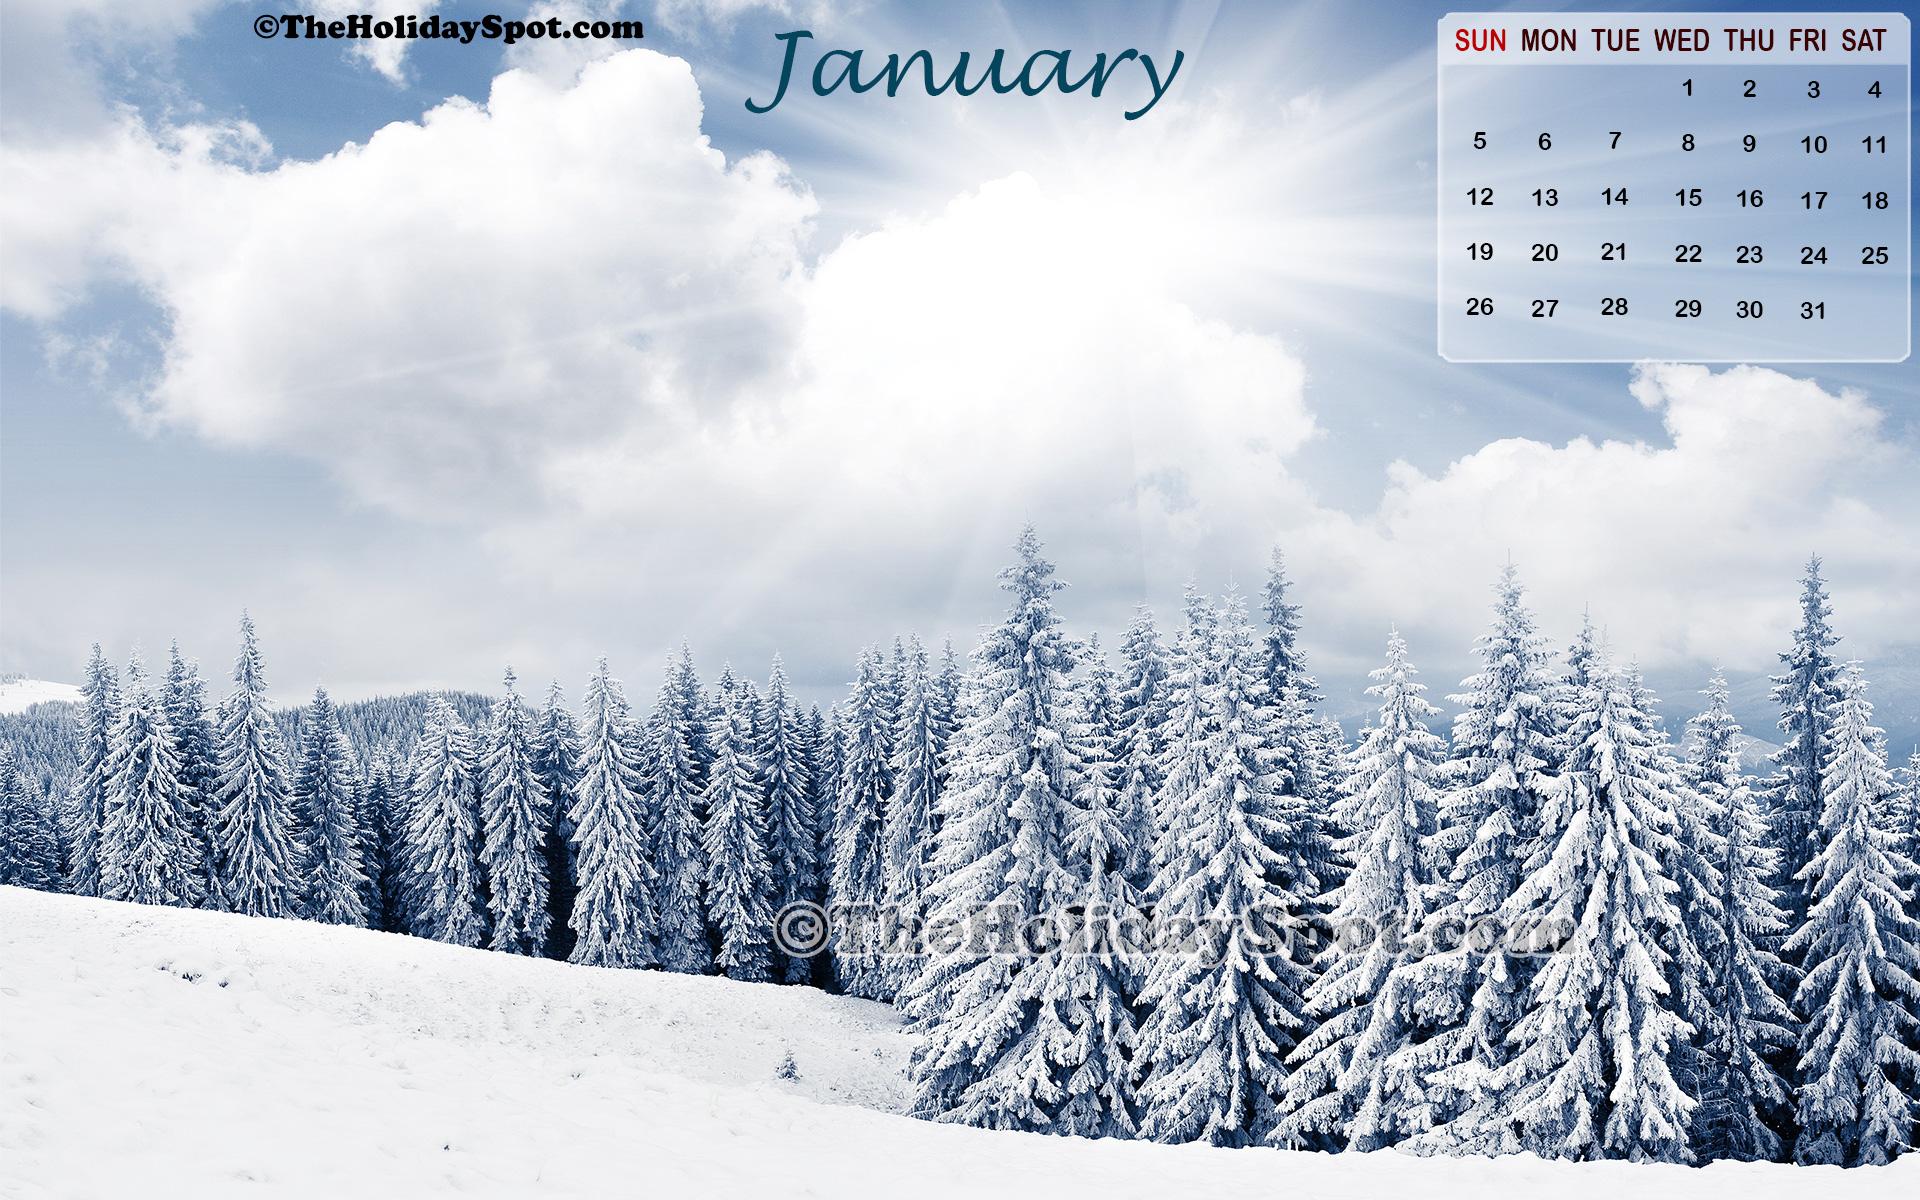 january 2014 wallpaper hd january 2014 backgrounds january wallpaper 1920x1200